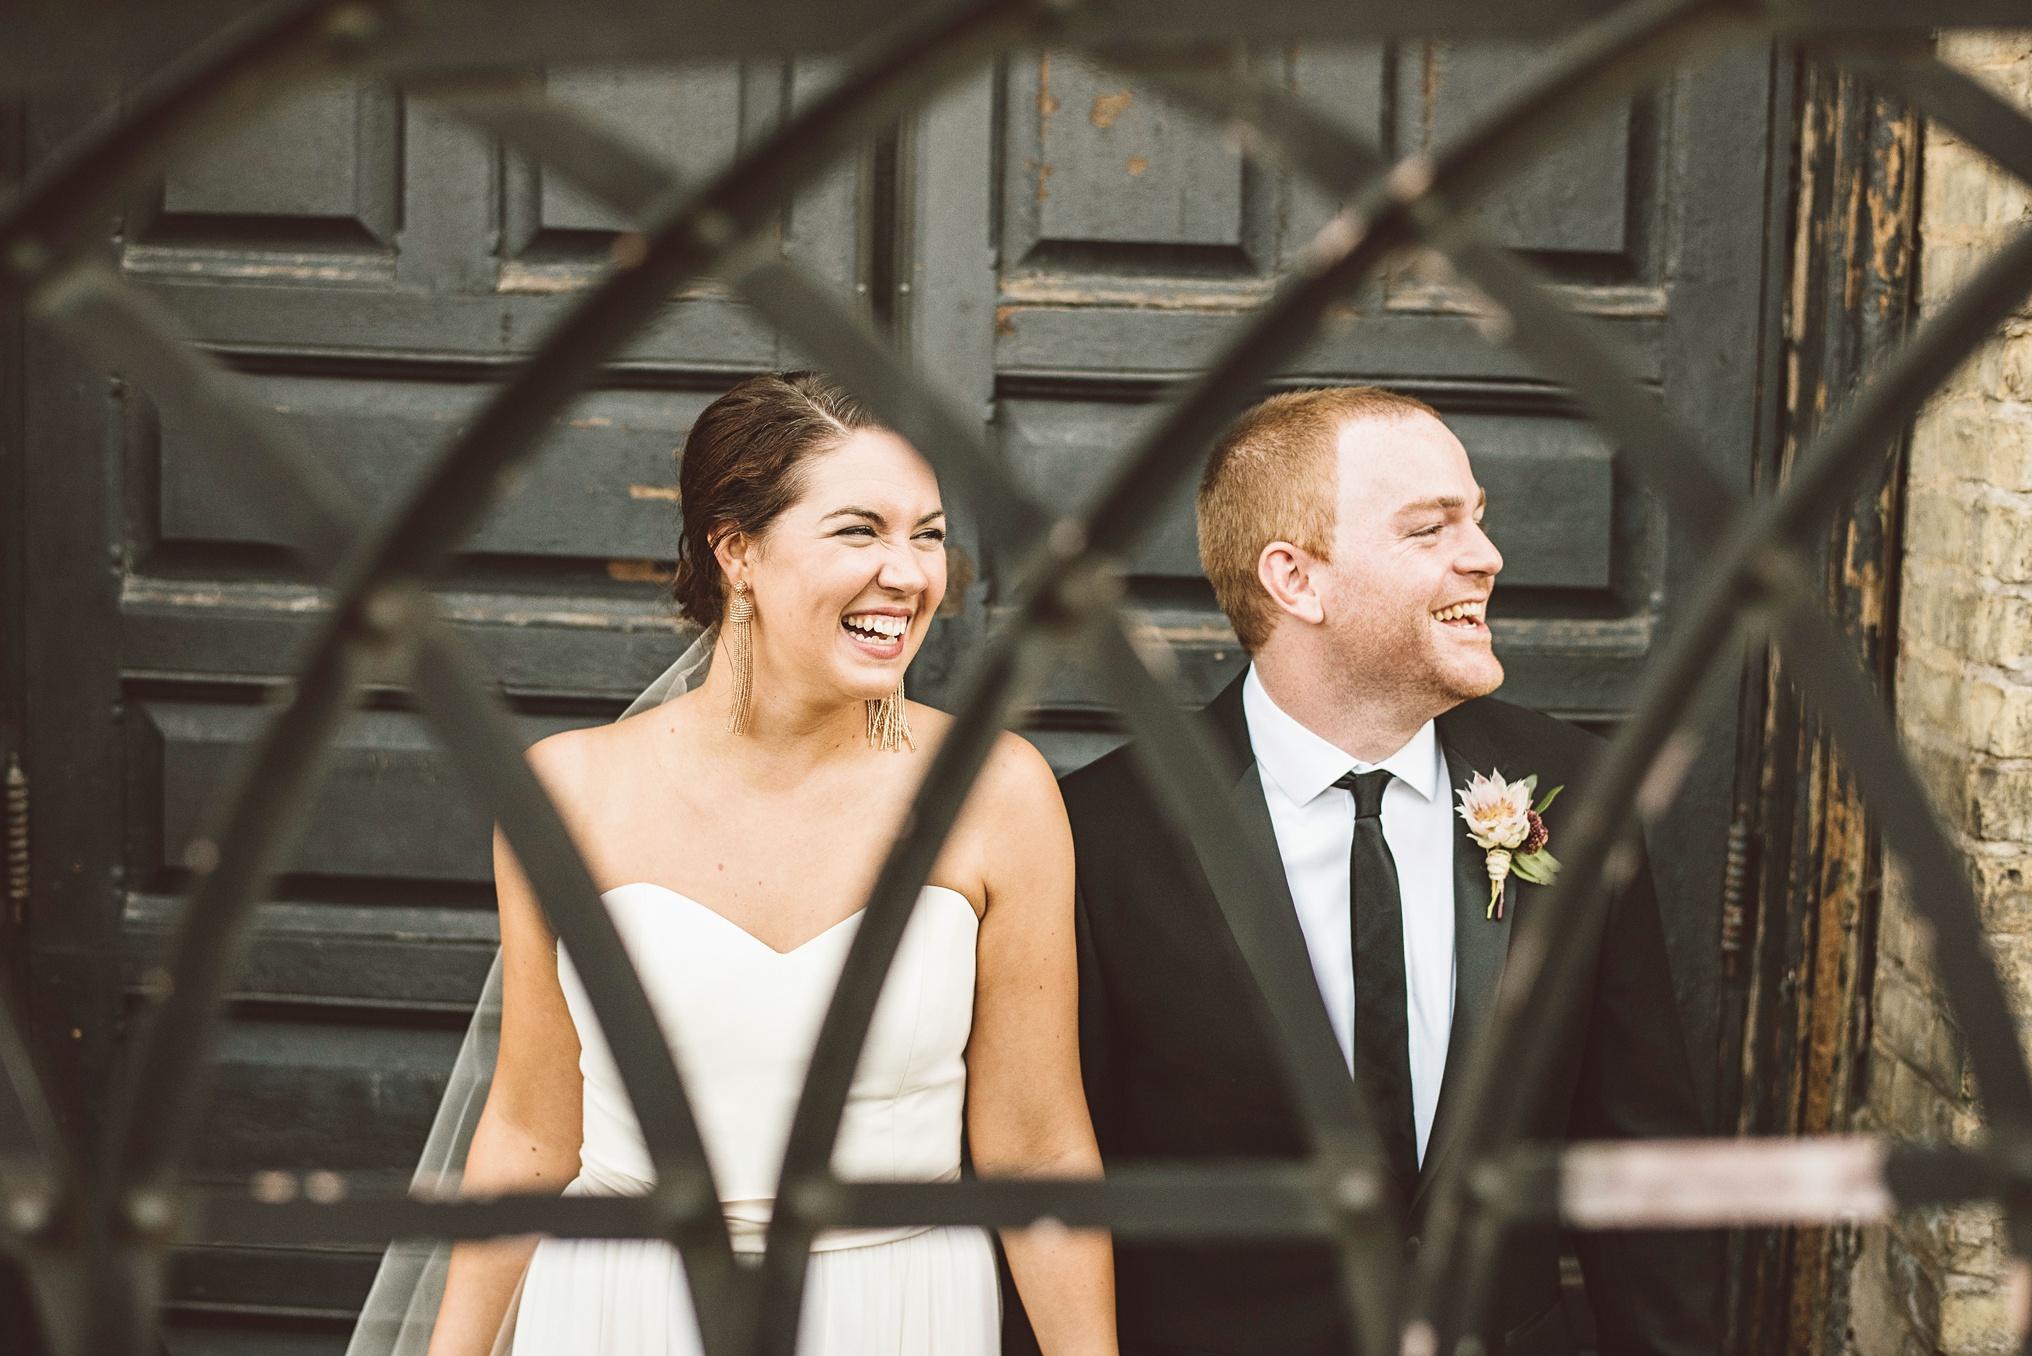 best_wedding_photography_2017_by_lucas_botz_photography_060.jpg